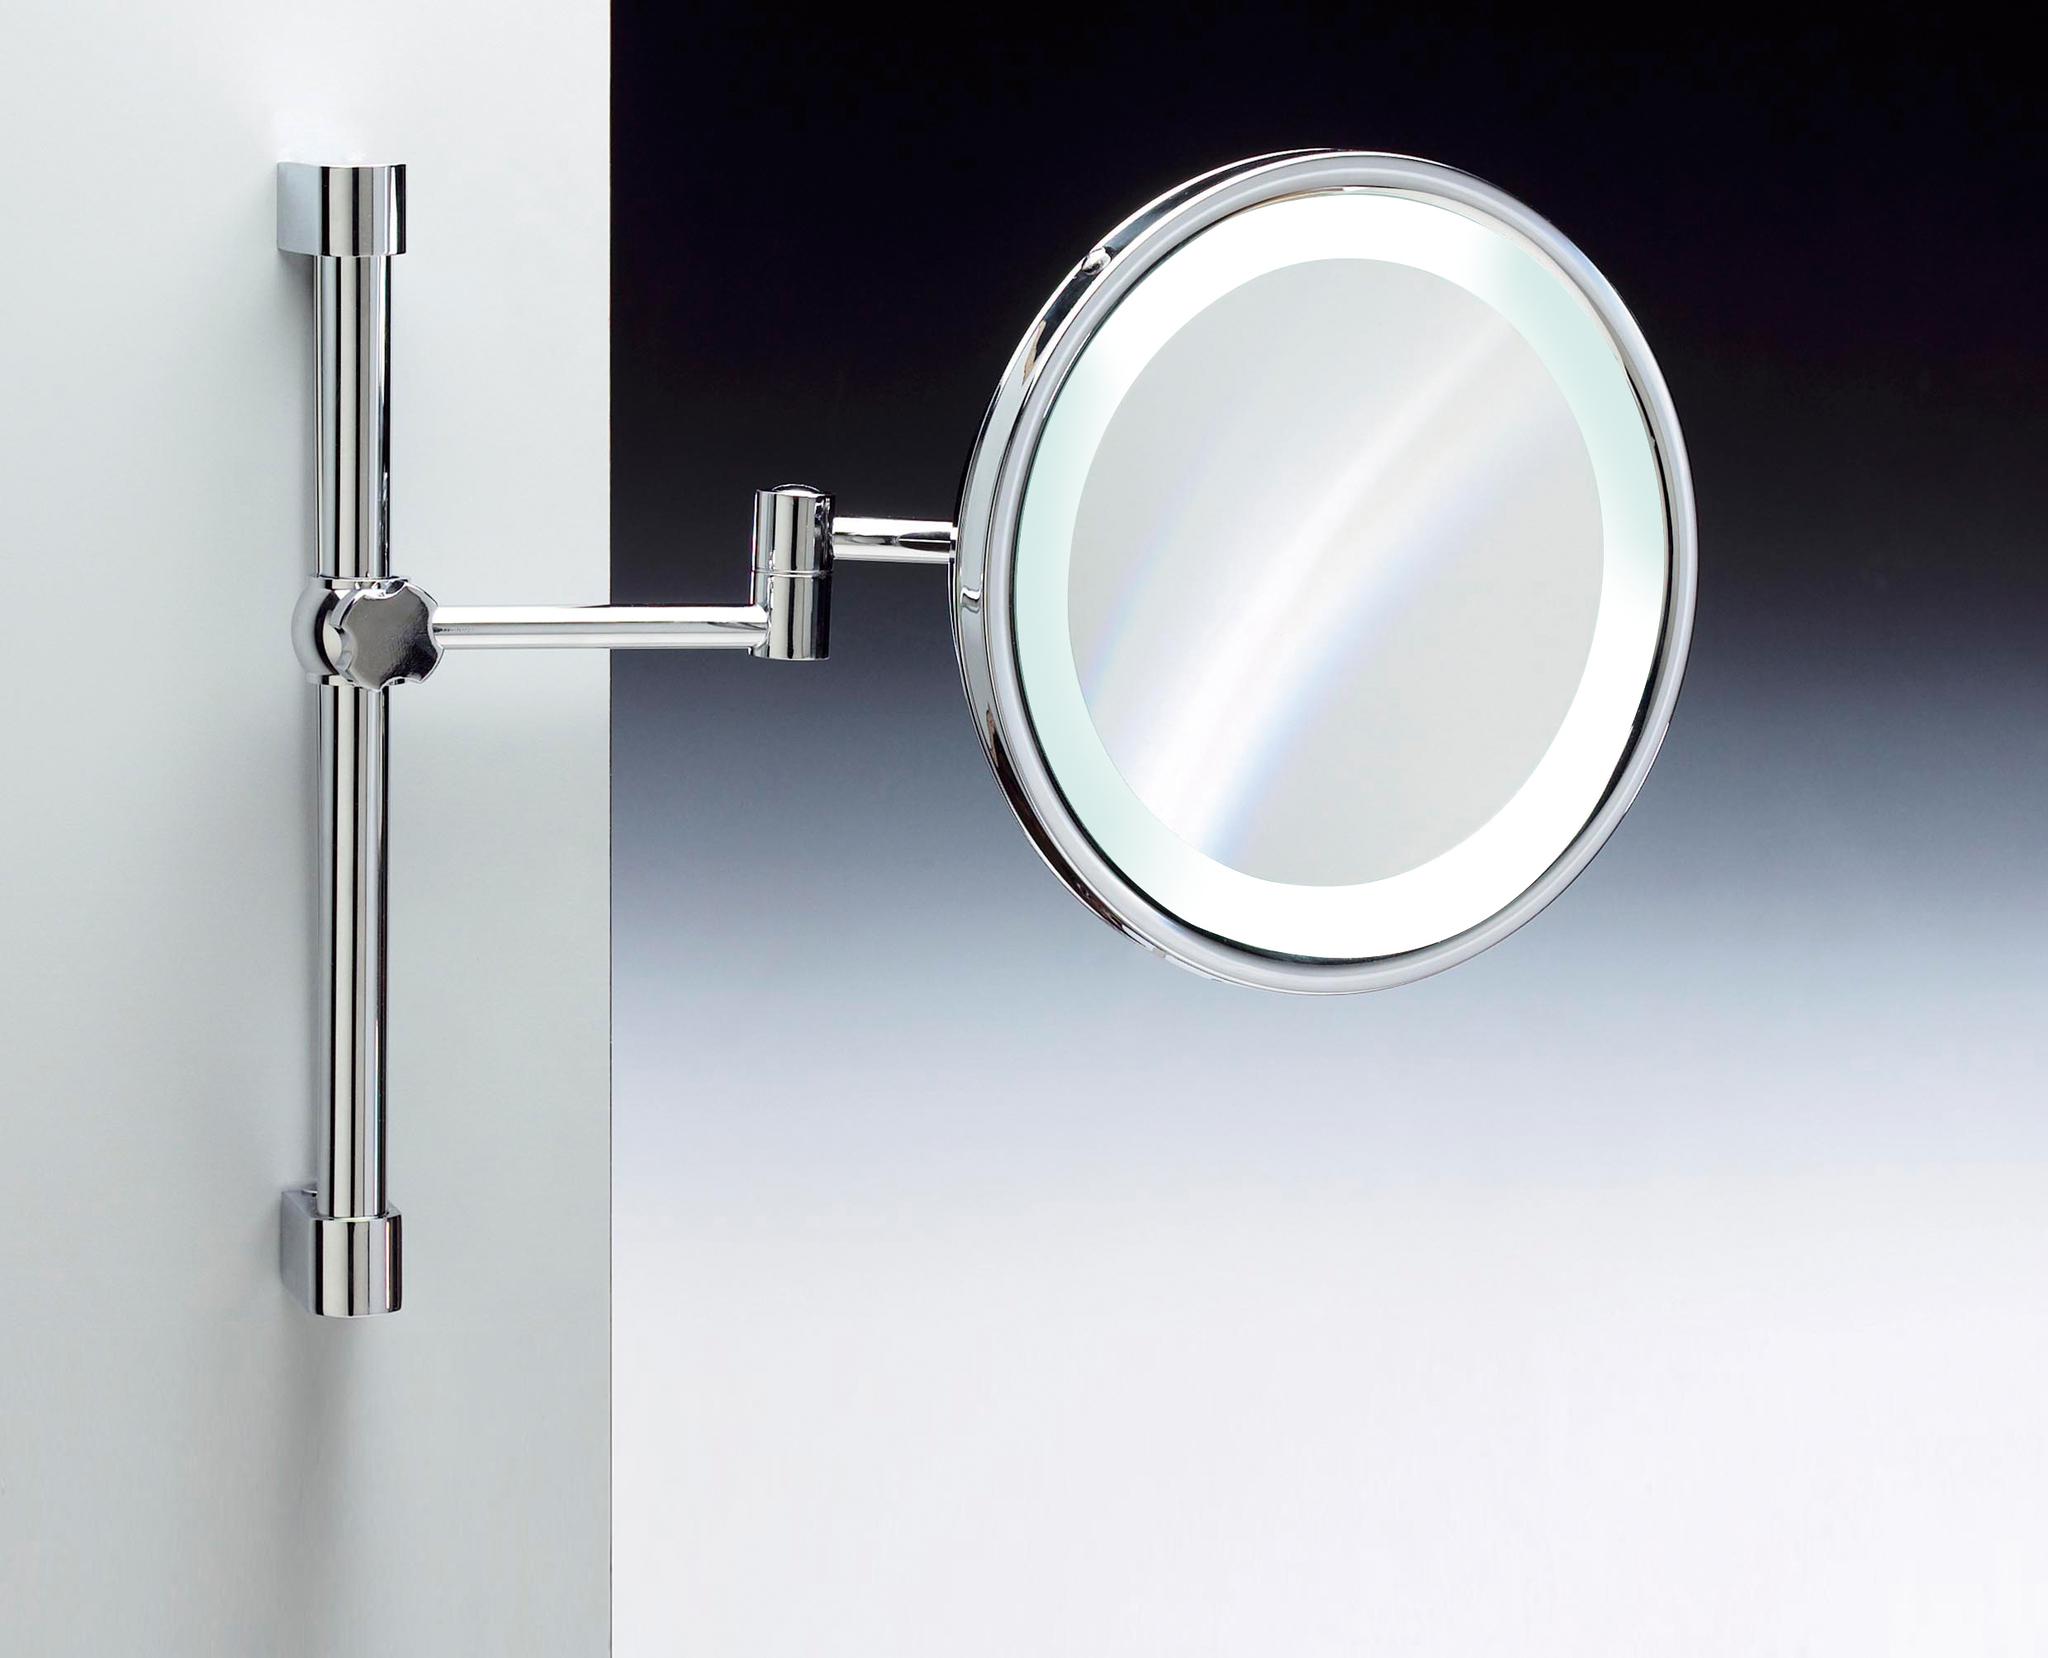 Зеркала Элитное зеркало косметическое 99189CRO 5X от Windisch elitnoe-zerkalo-kosmeticheskoe-99189-ot-windisch-ispaniya.jpg